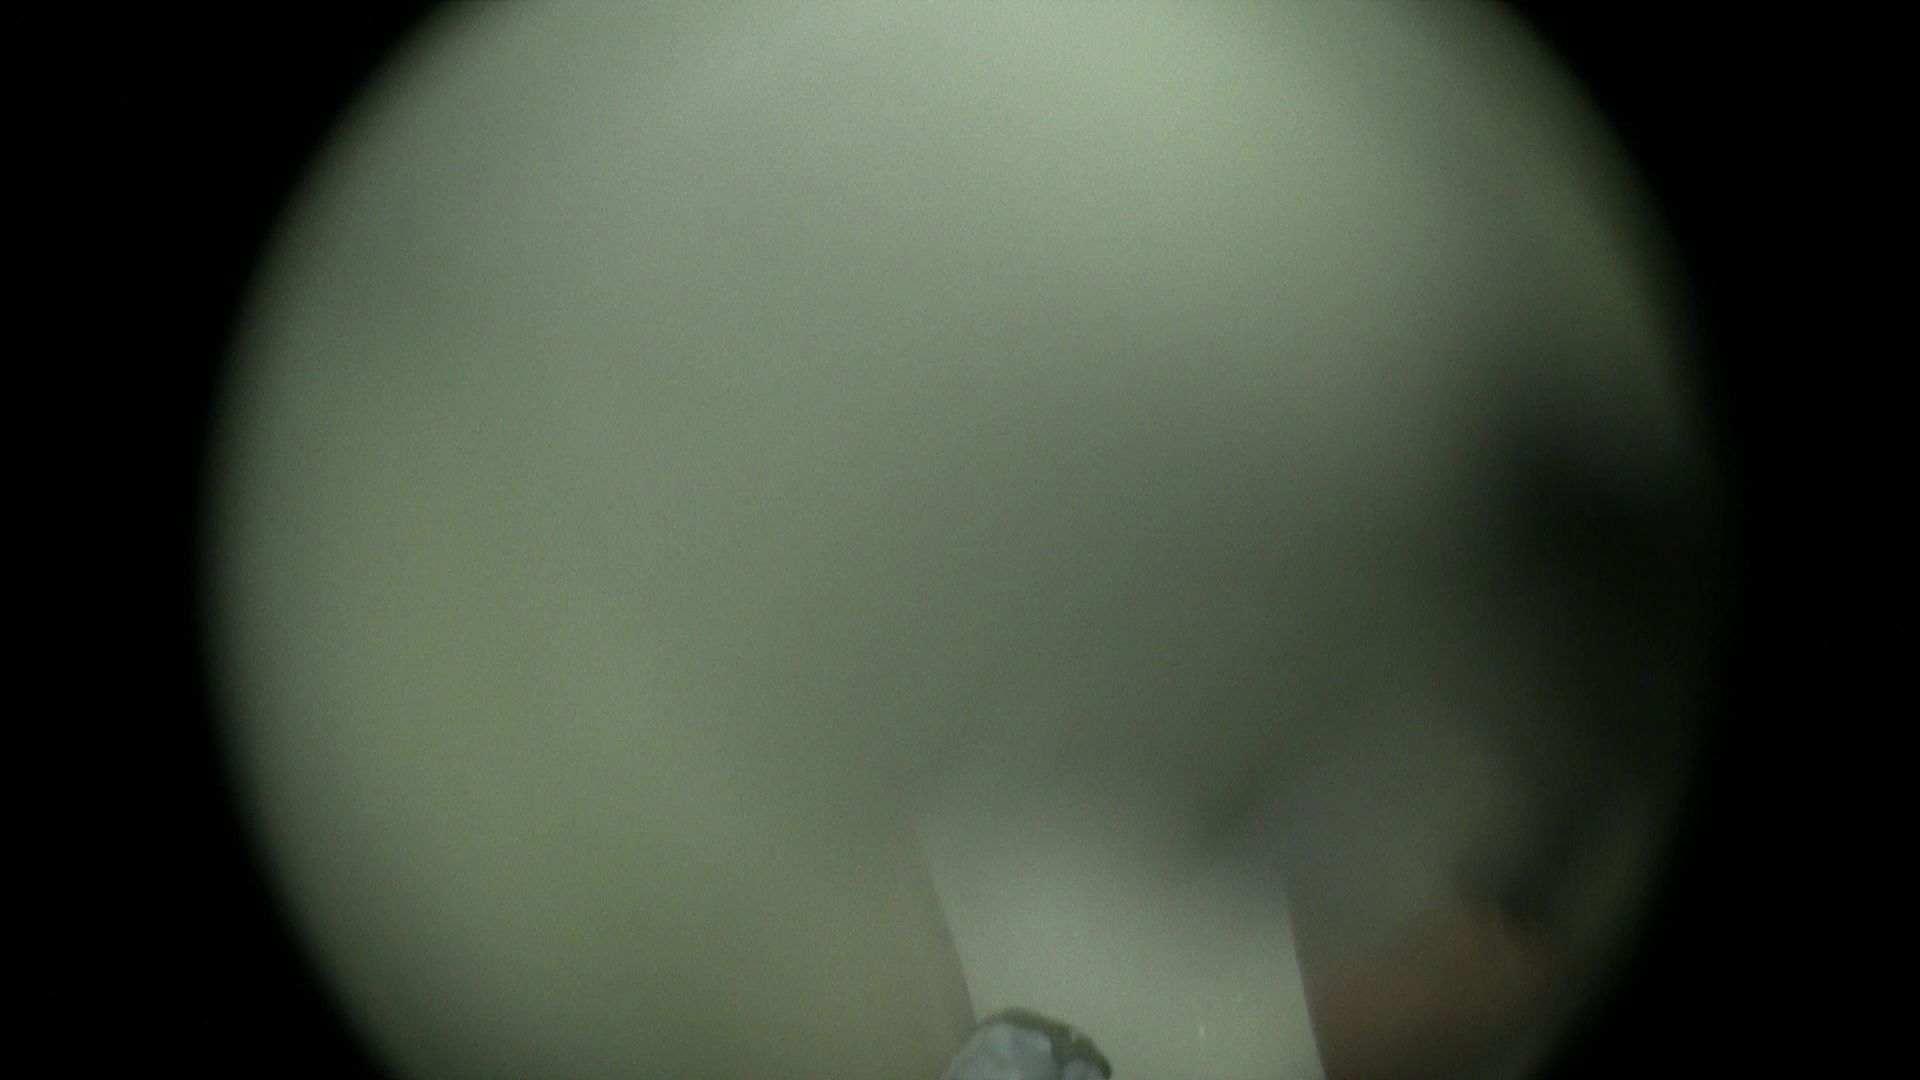 NO.31 カップルの悪い例 シャワー室 セックス画像 106PIX 30